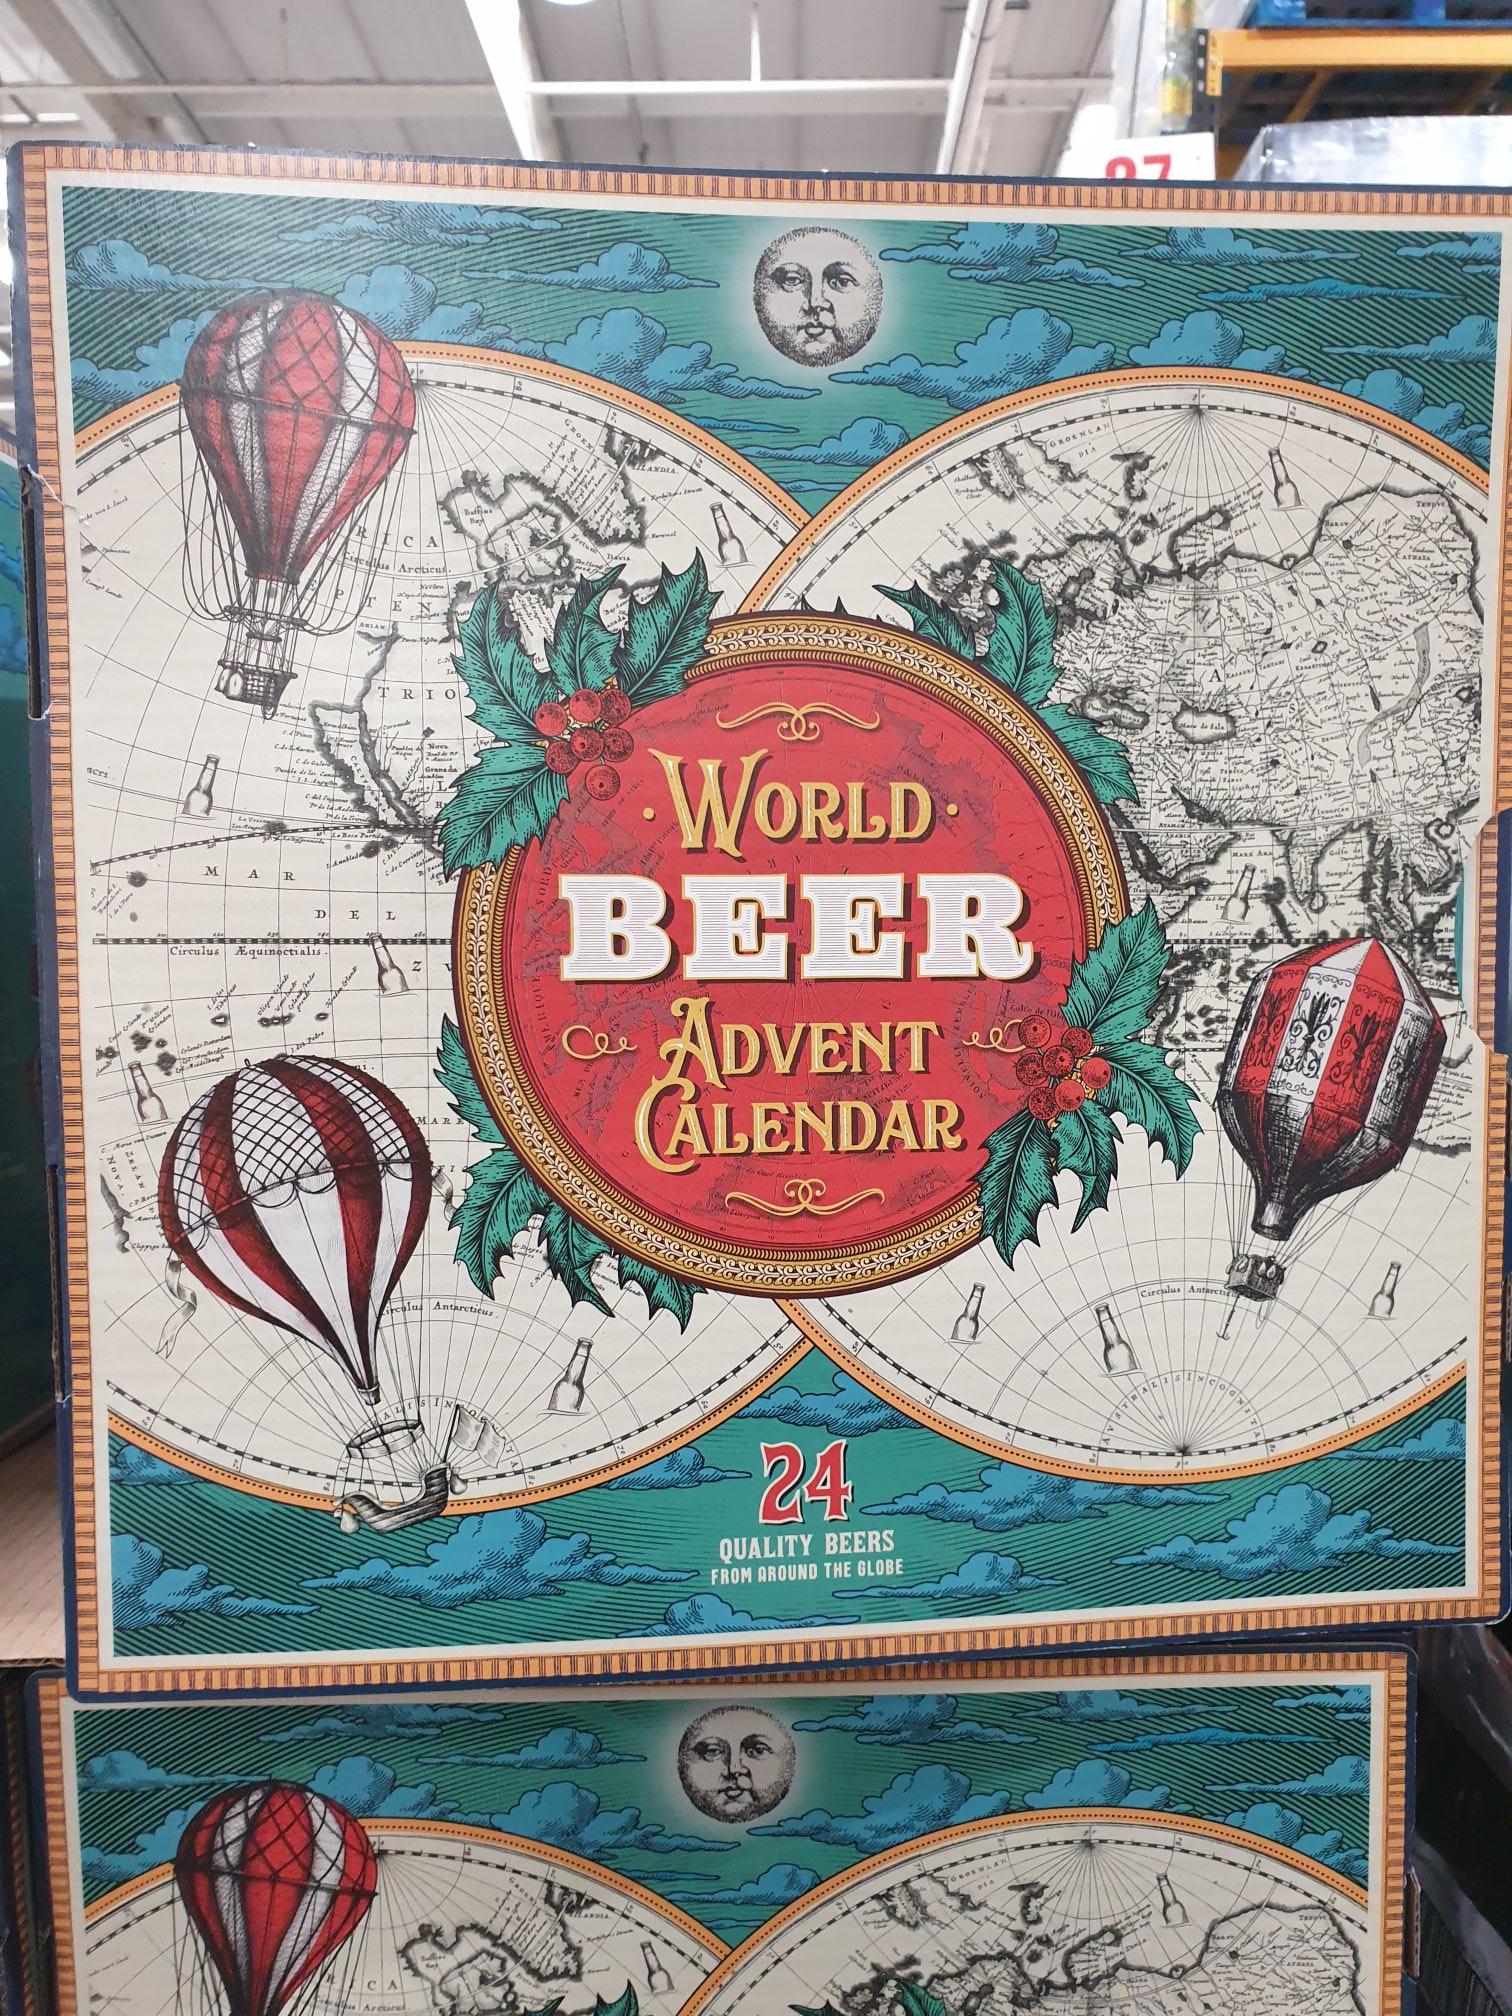 World Beer Advent Calendar' £35.98 @ Costco (Thurrock)